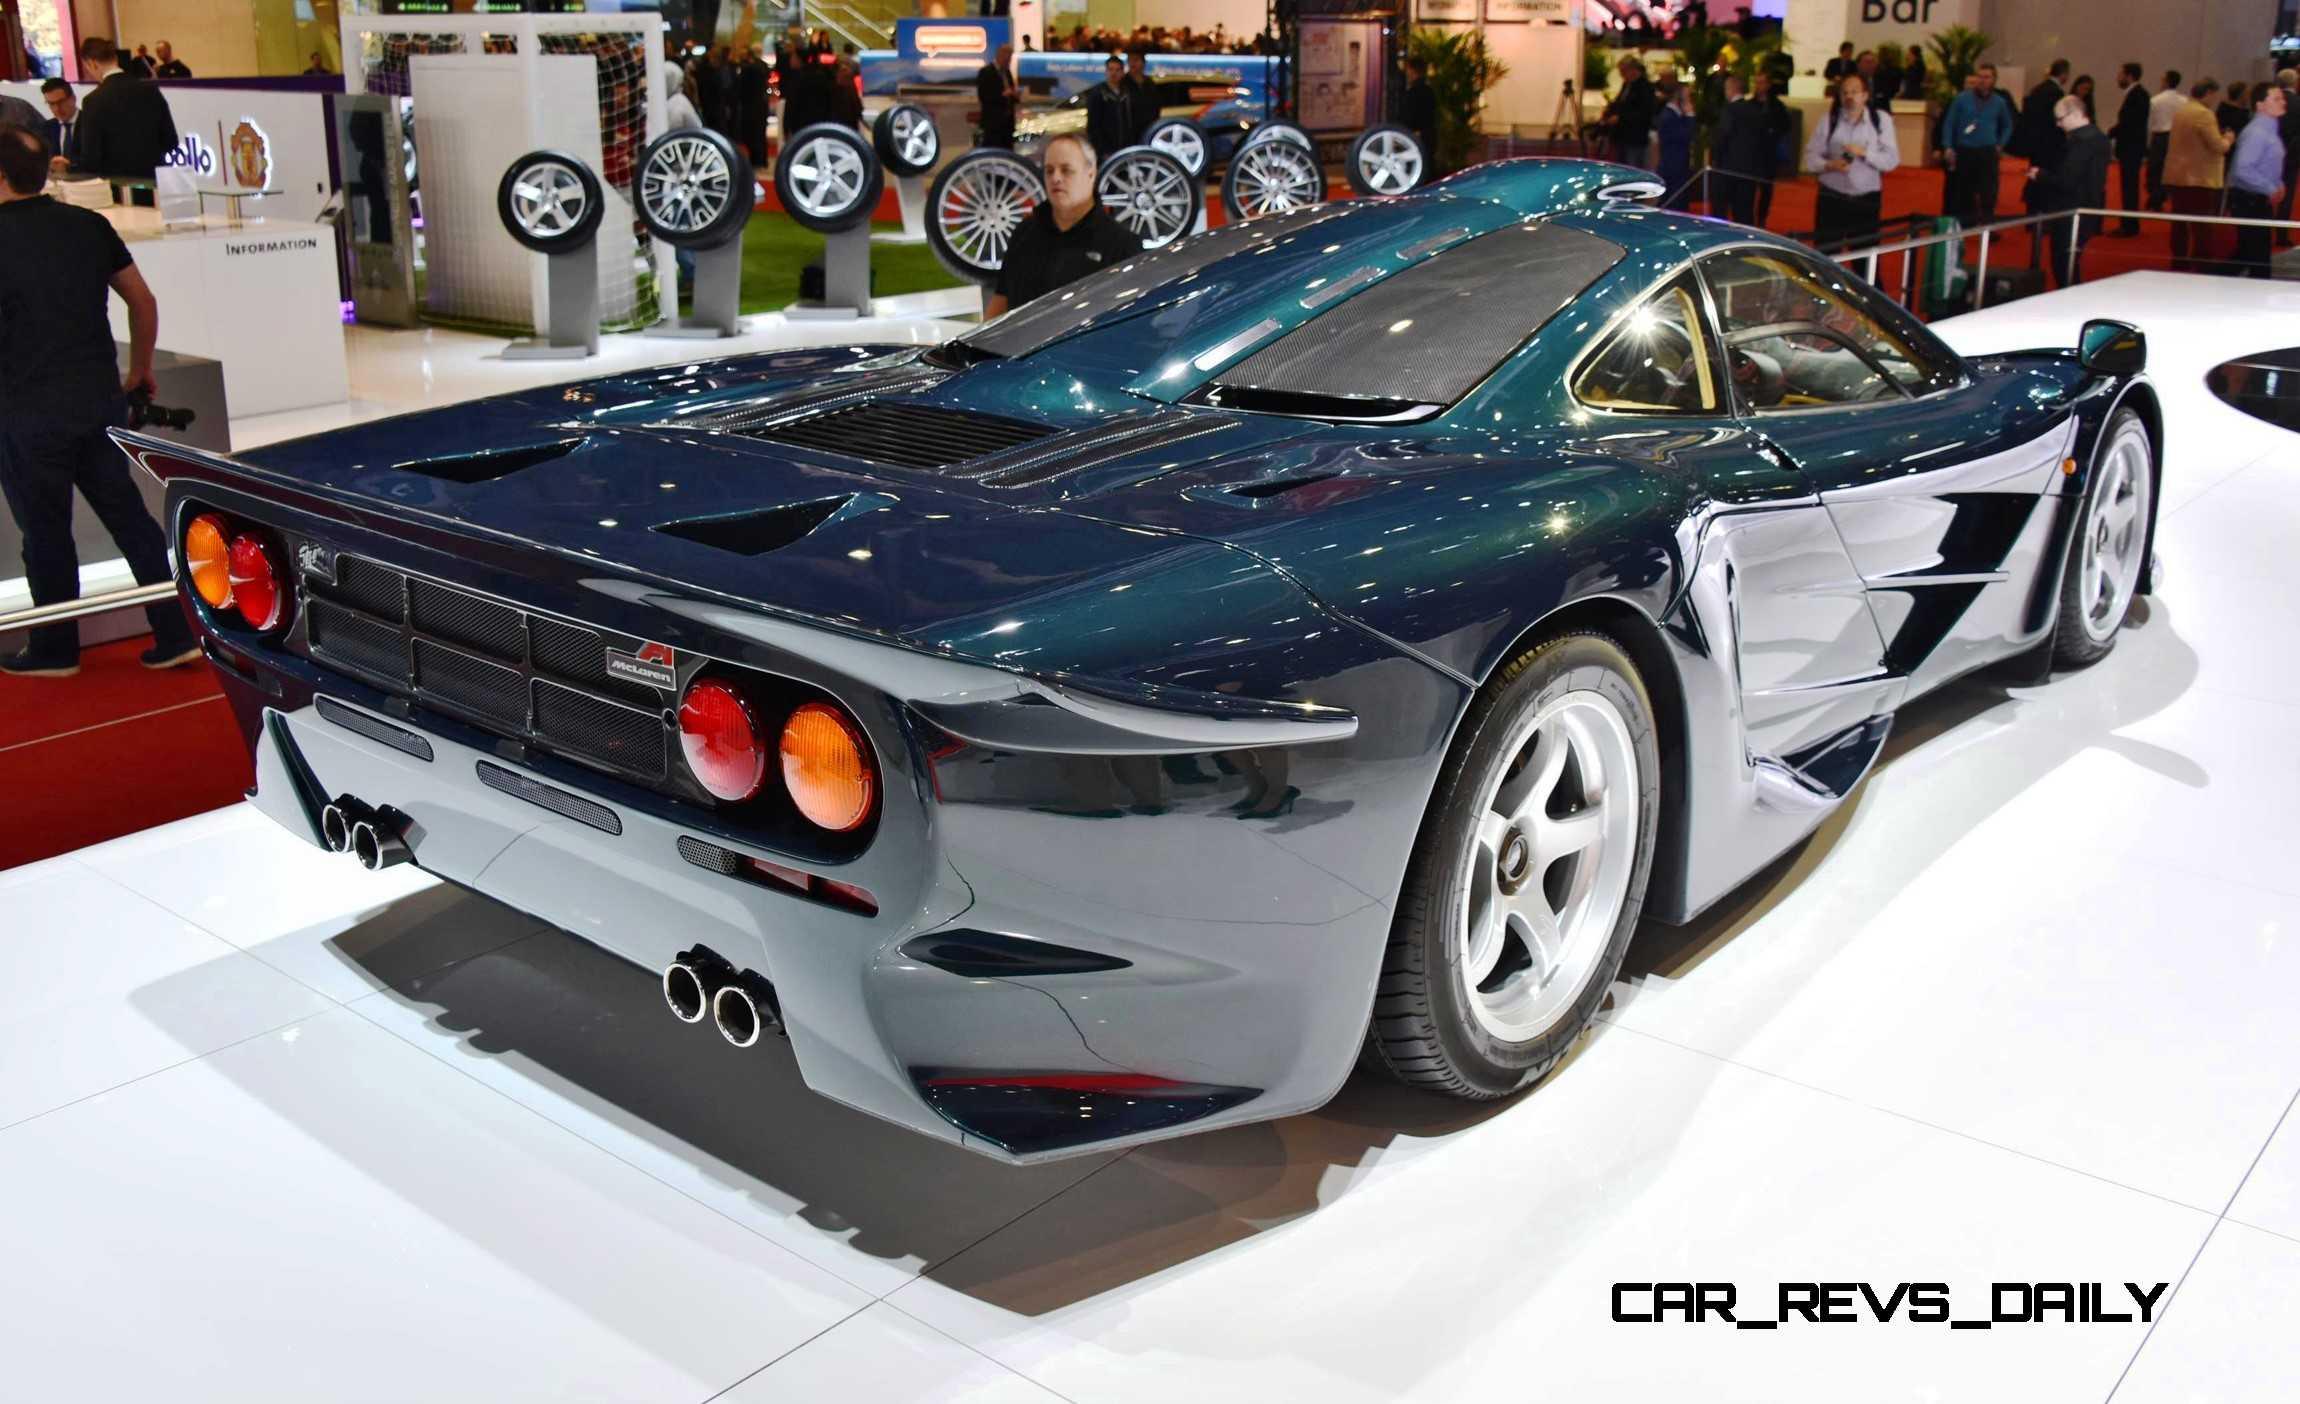 http://www.car-revs-daily.com/wp-content/uploads/2015/03/2016-McLaren-P1-GTR-Meets-1997-McLaren-F1-GT-LongTail-In-Geneva-28.jpg